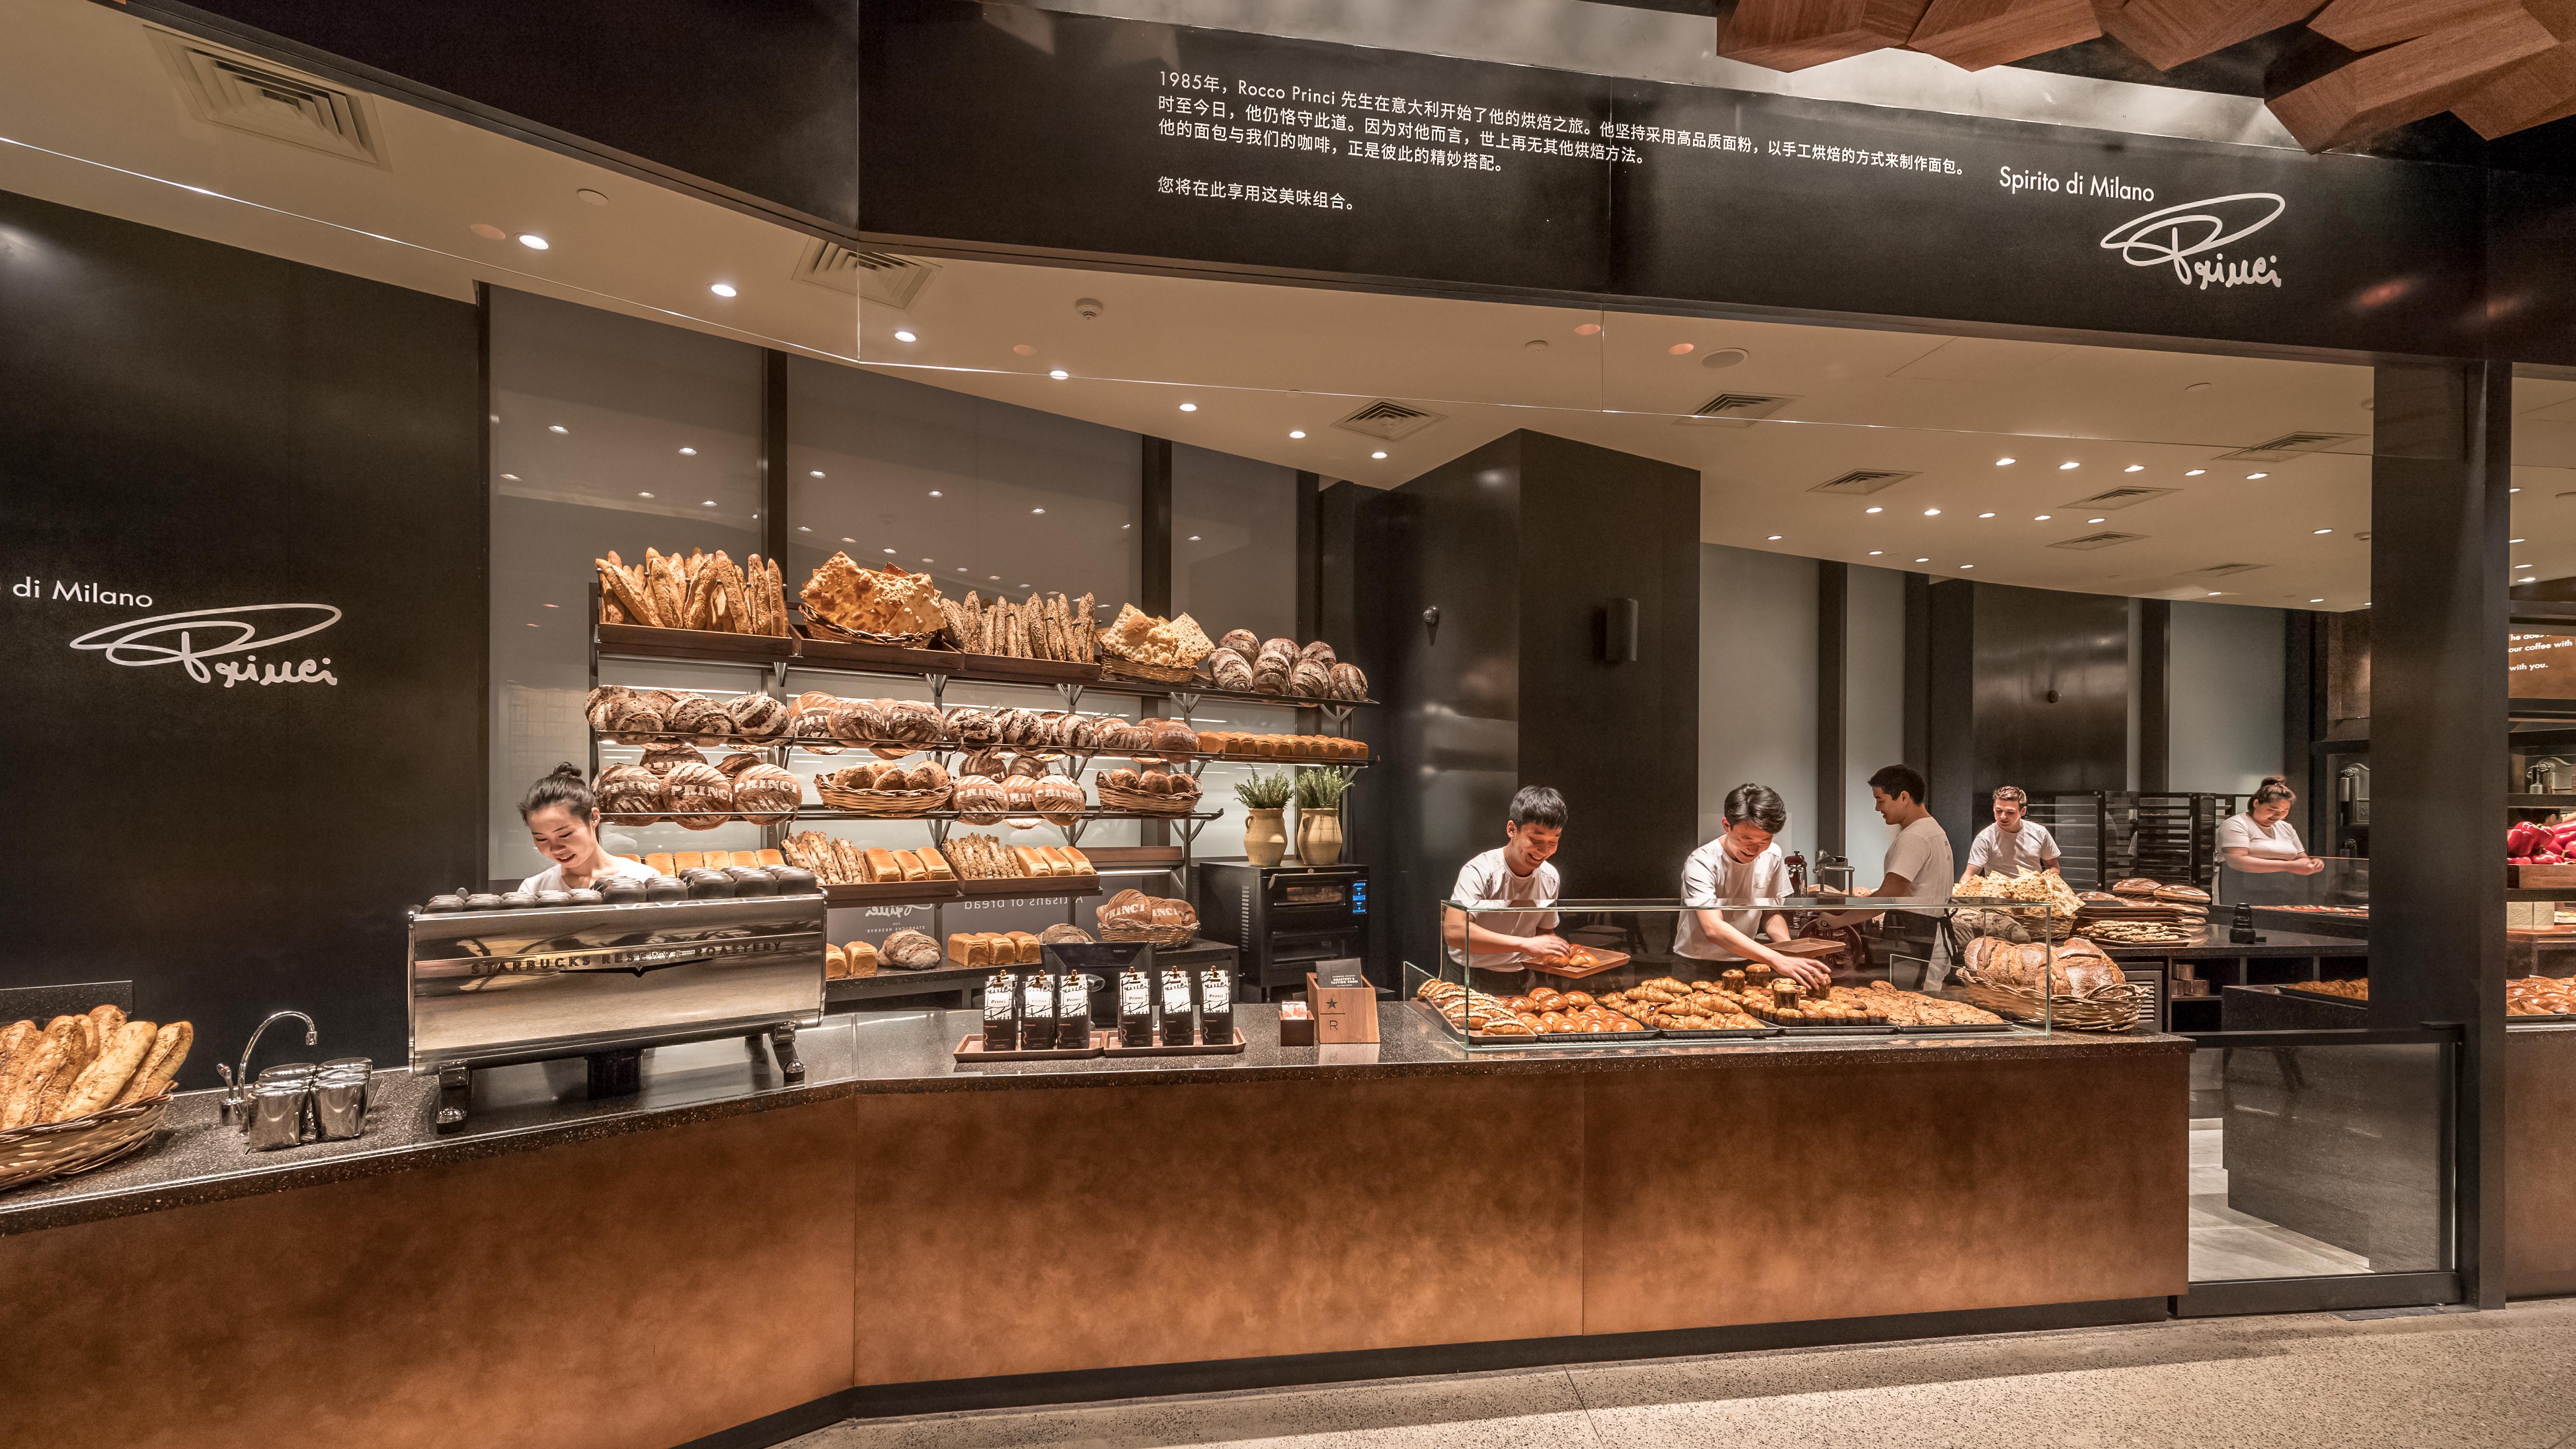 Starbucks más grande del mundo shanghai rostery